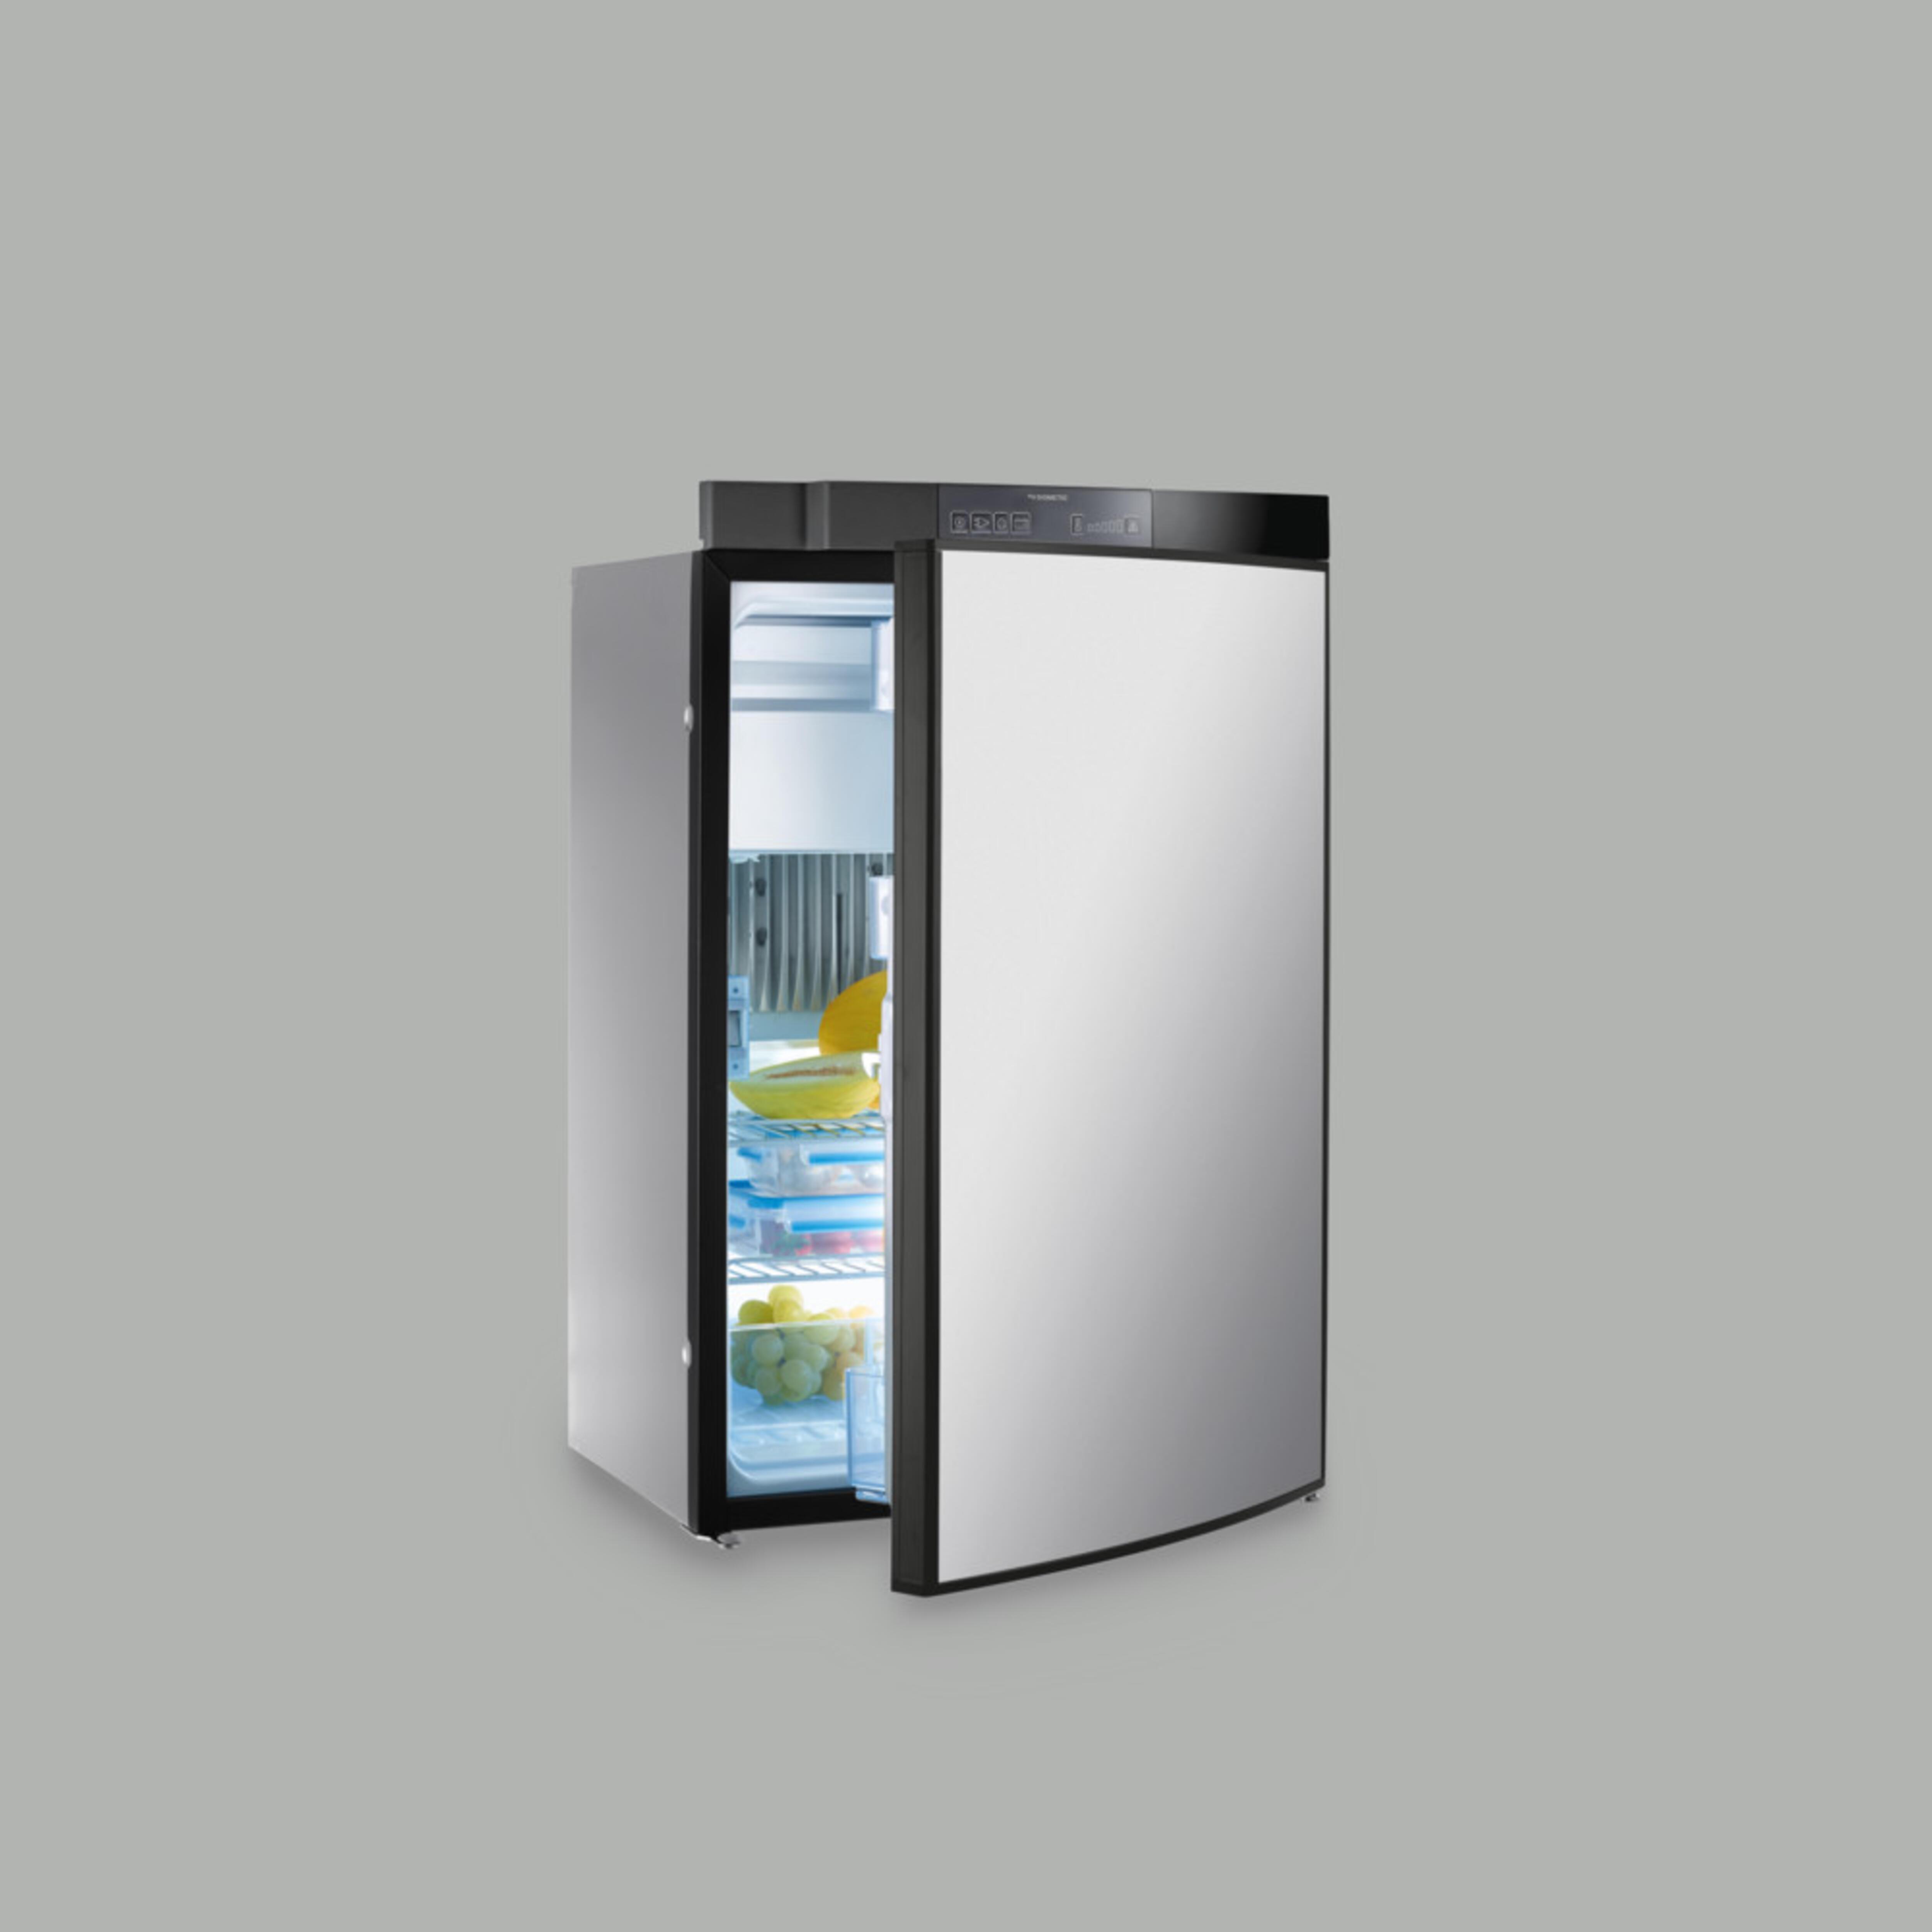 ᐅ rv, boat \u0026 truck refrigerators \u2013 compact, silent and durabledometic rm 8501 refrigerator 3 7 cu ft , right hand hinge,